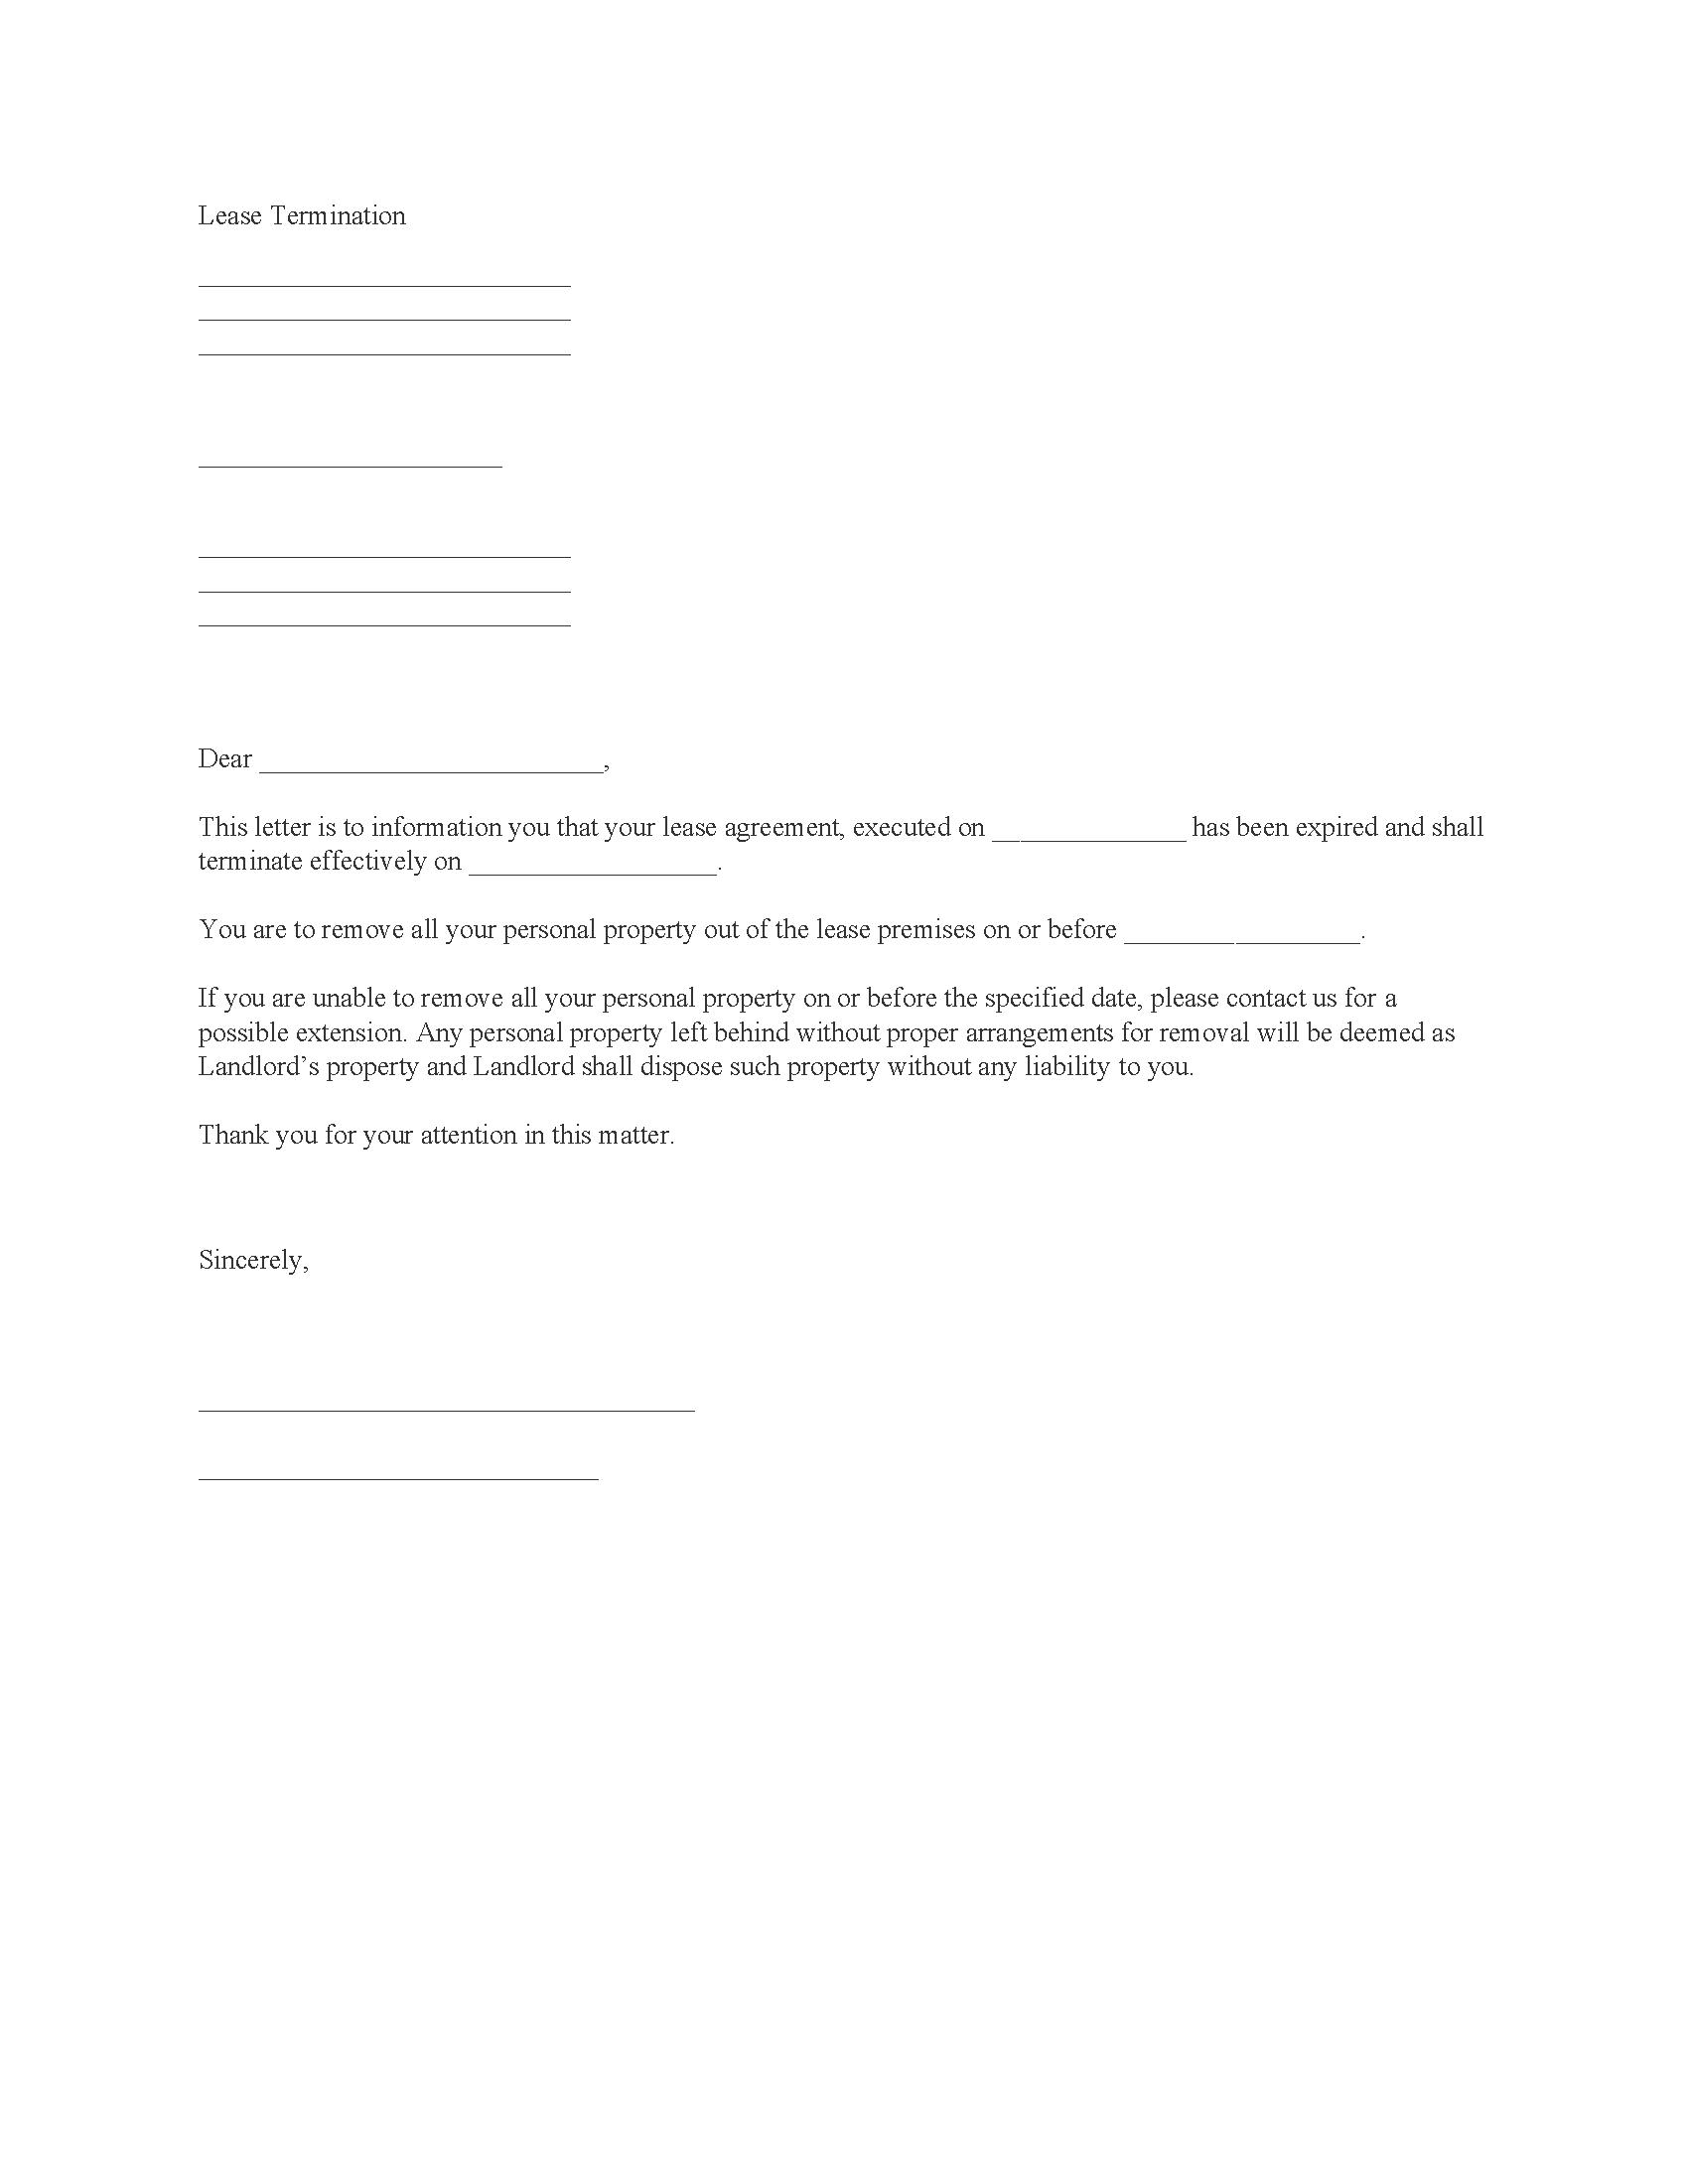 Lease Termination Notice Form